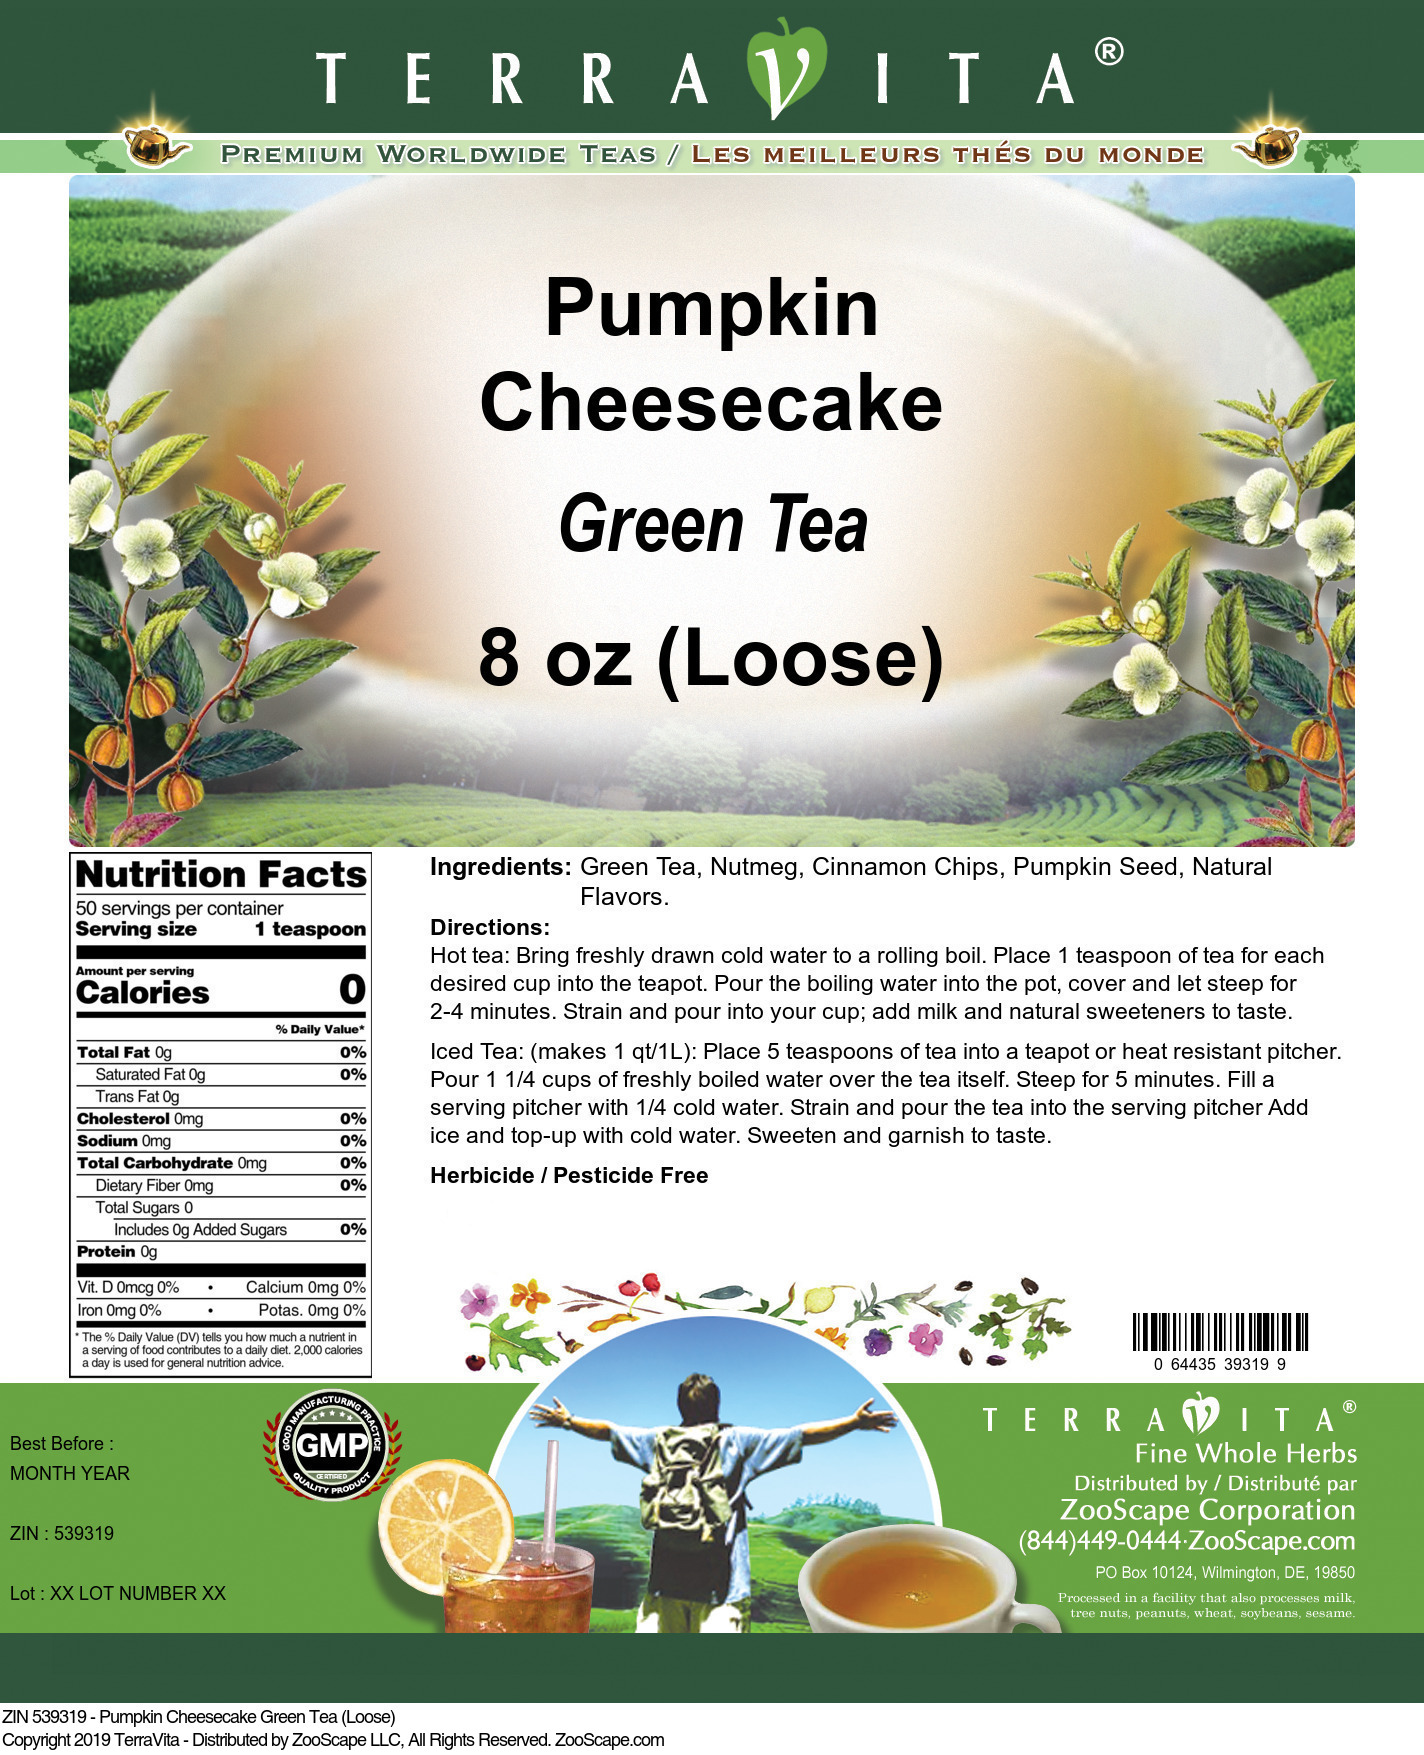 Pumpkin Cheesecake Green Tea